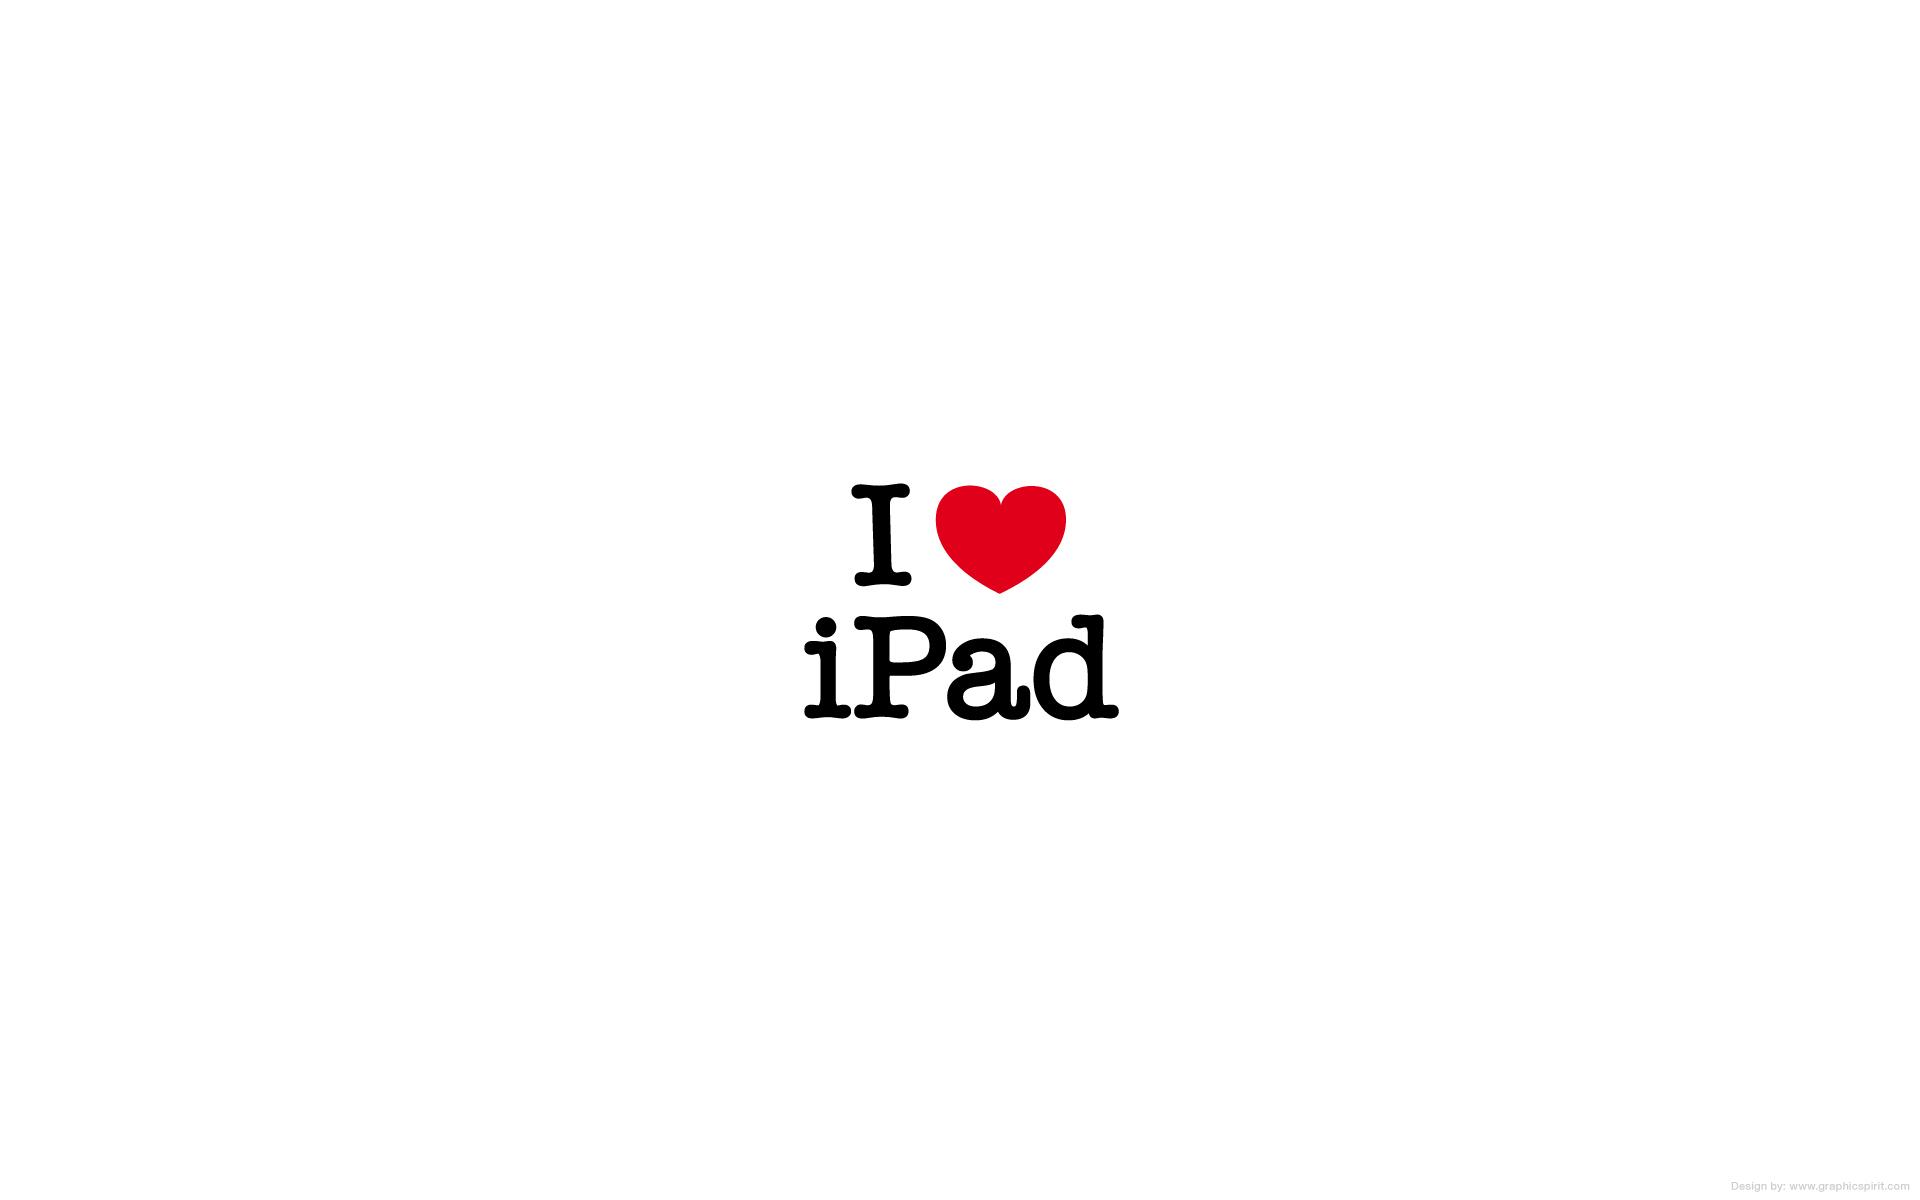 Yo amo mi iPad - 1920x1200